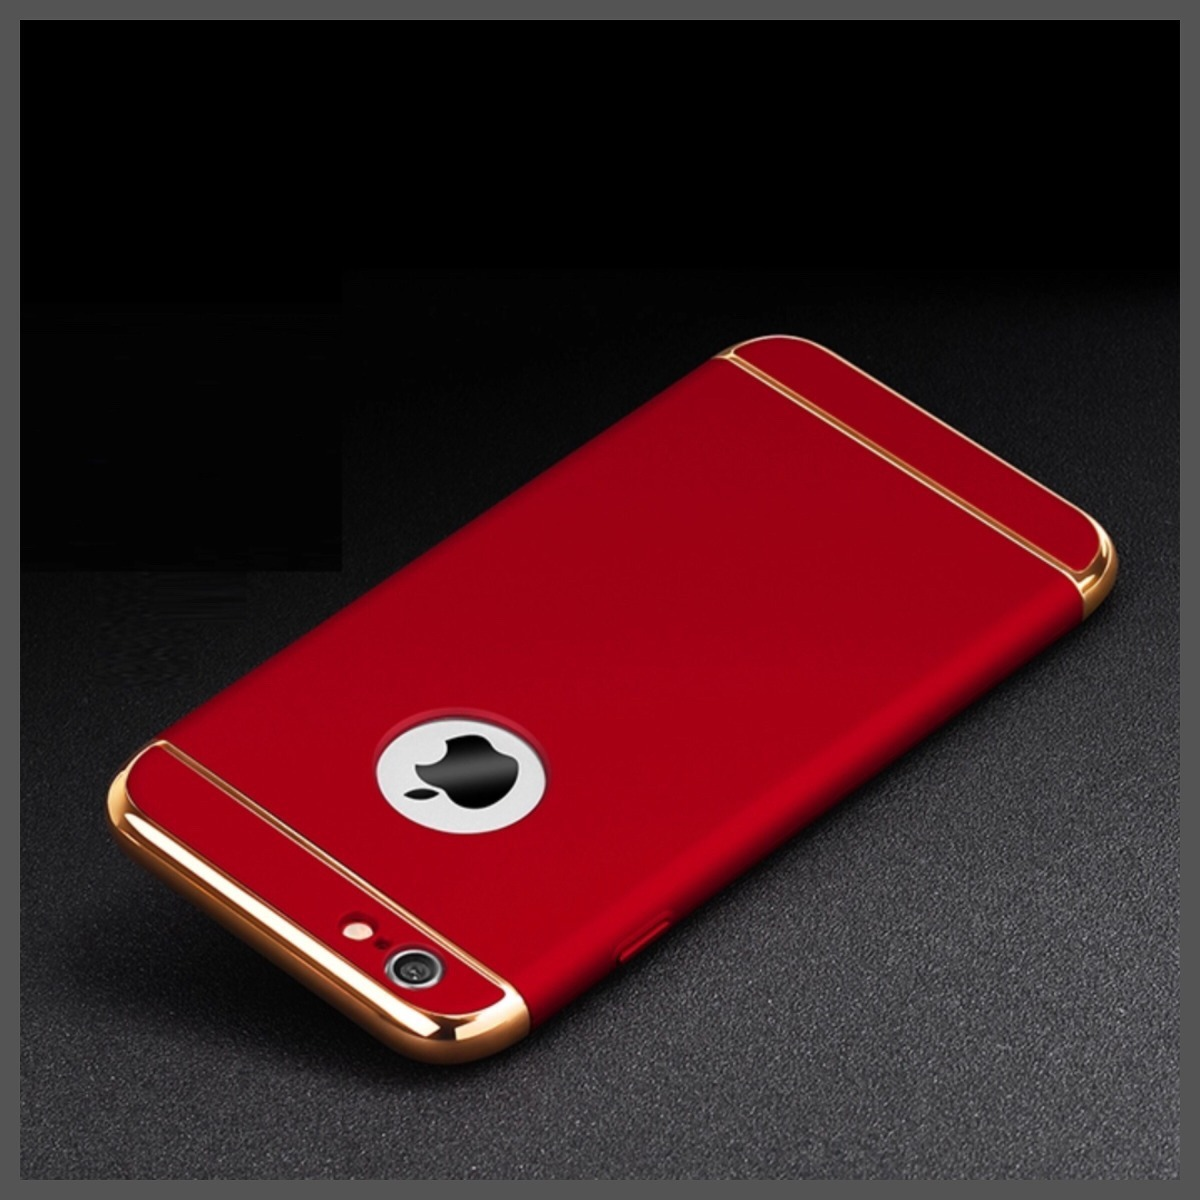 f6b35258f30 funda case iphone 7 7 plus skin apple temperd glass cristal. Cargando zoom.